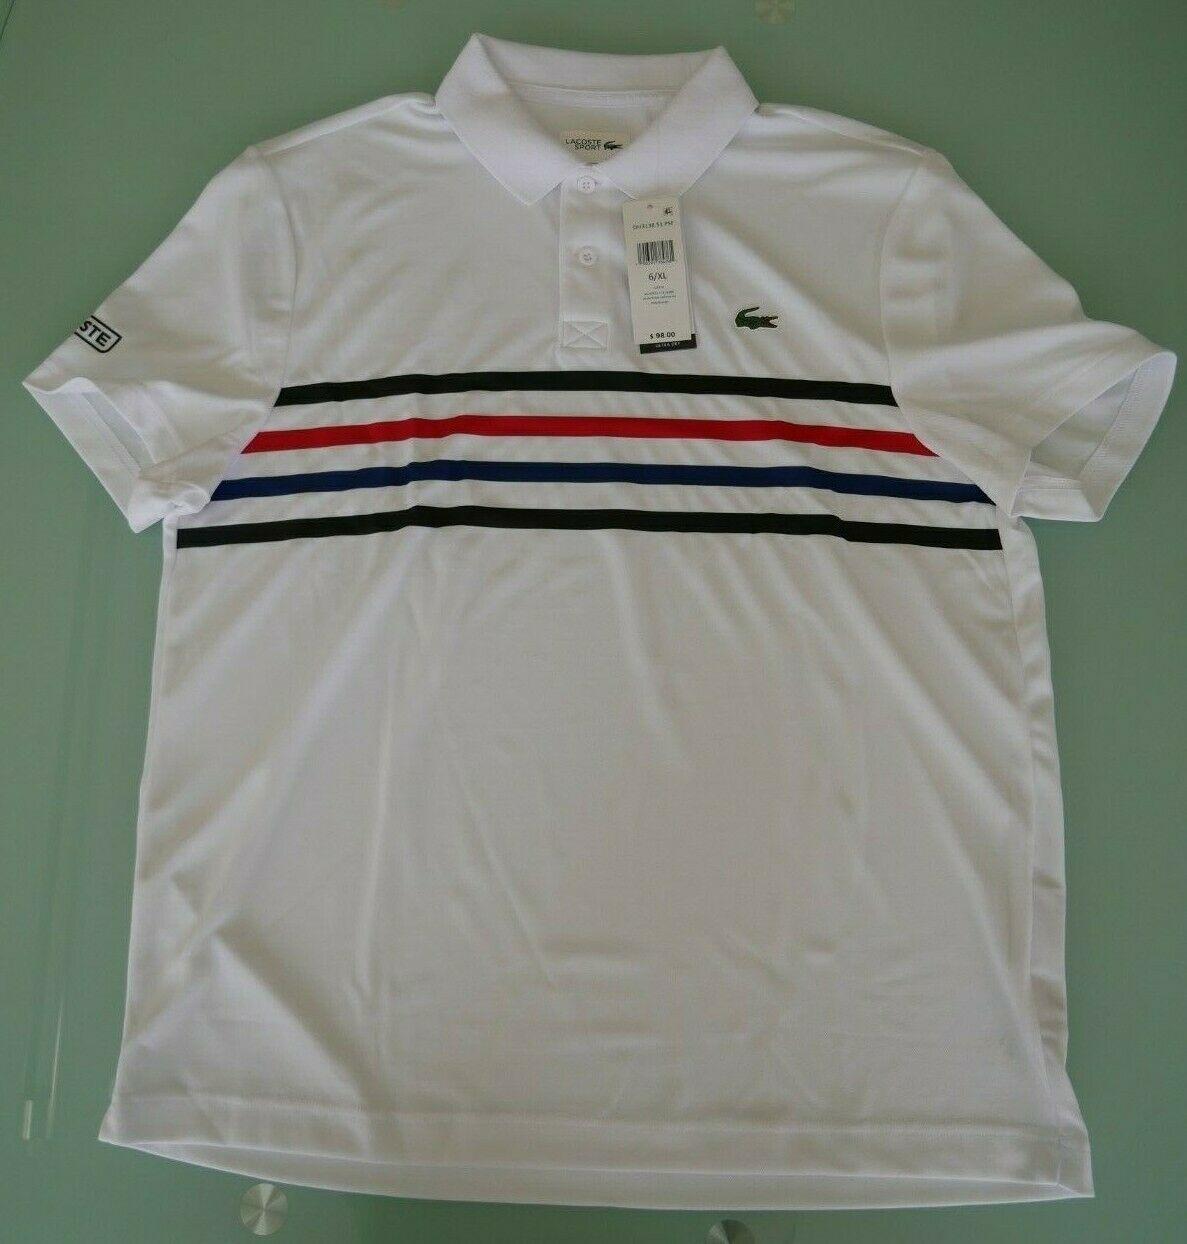 Lacoste Sport Mens Pique Tennis Polo DH3138 51 PSF NWT - $55.00